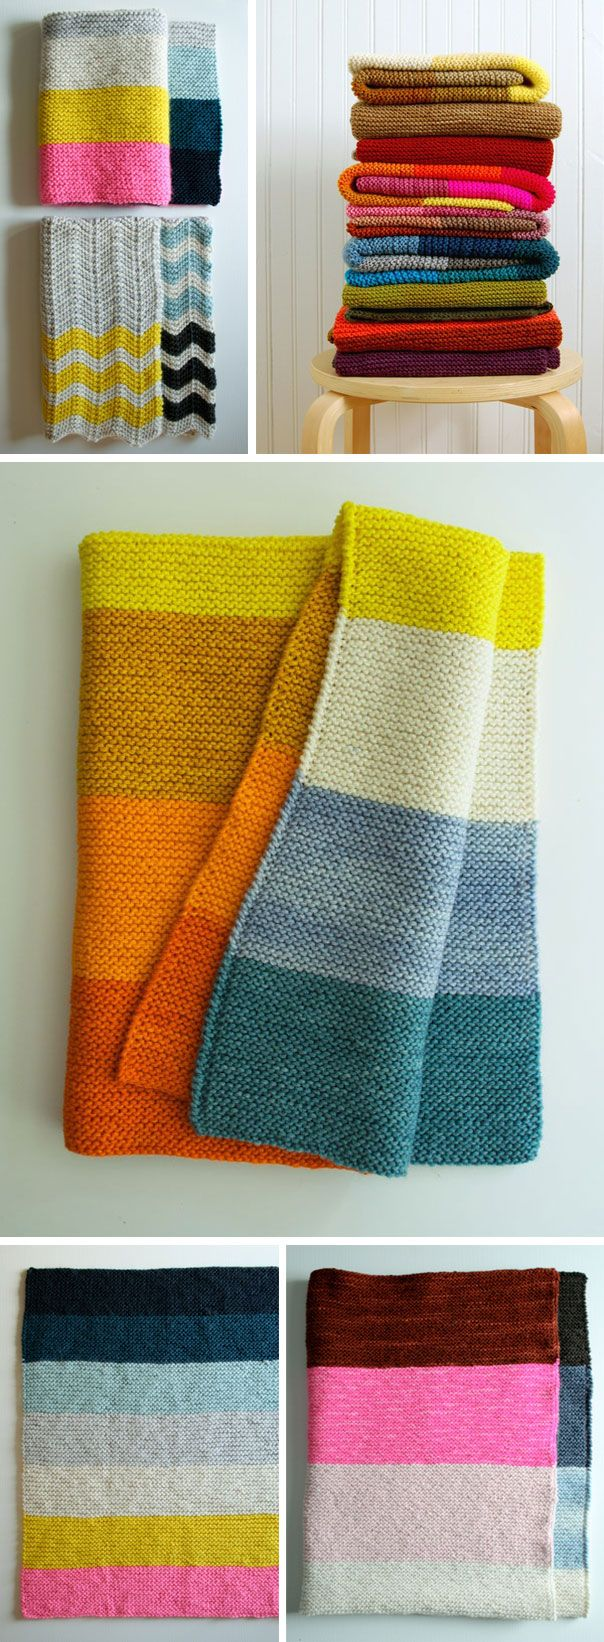 Colorblock knitting  http://ninainvorm.punt.nl/